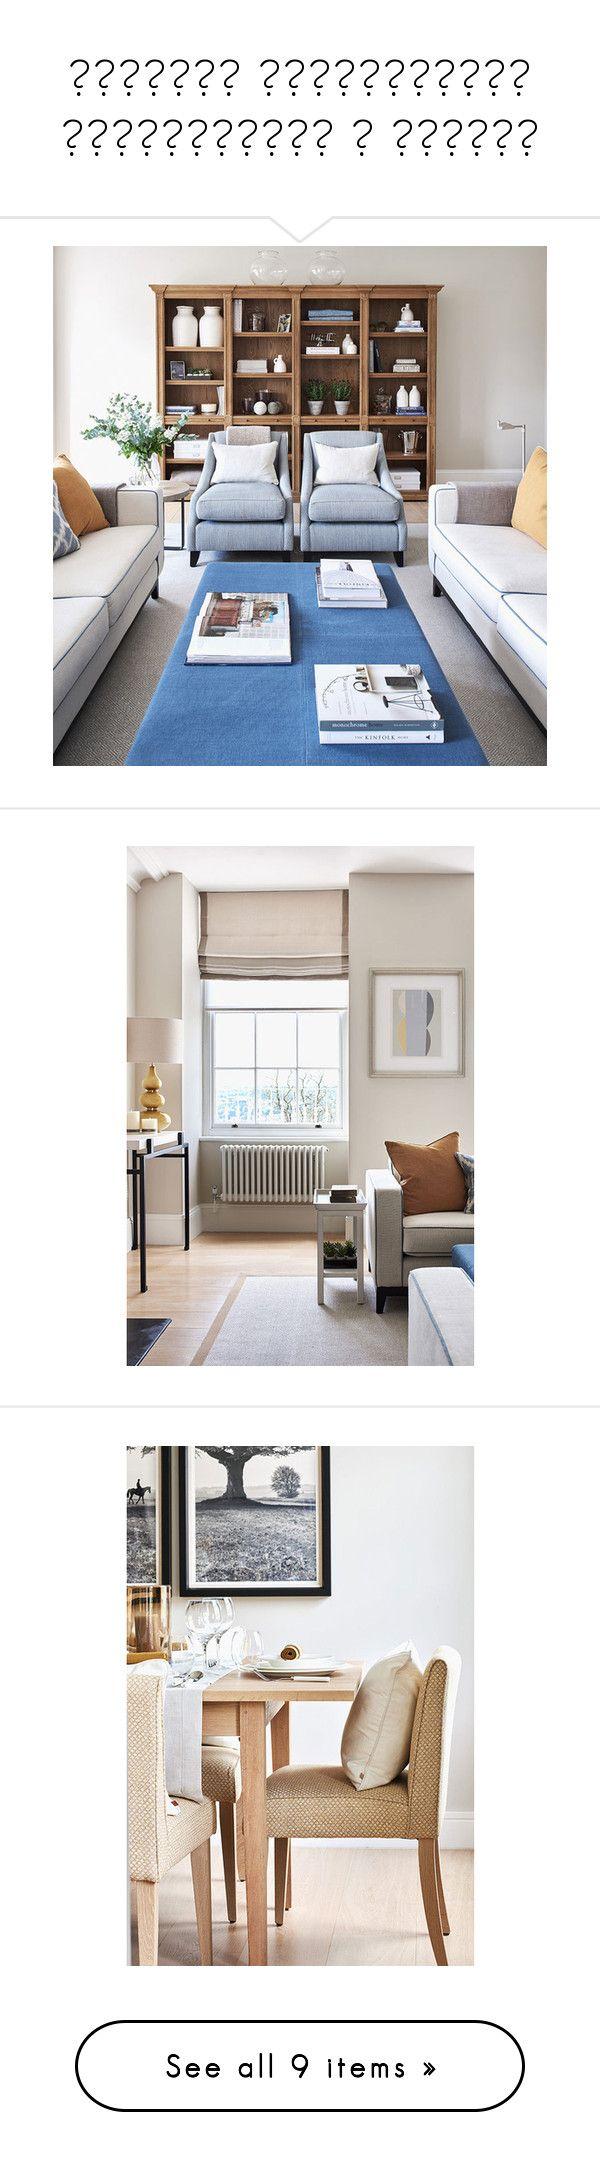 """Светлые современные апартаменты в Англии"" by loicismylover ❤ liked on Polyvore"